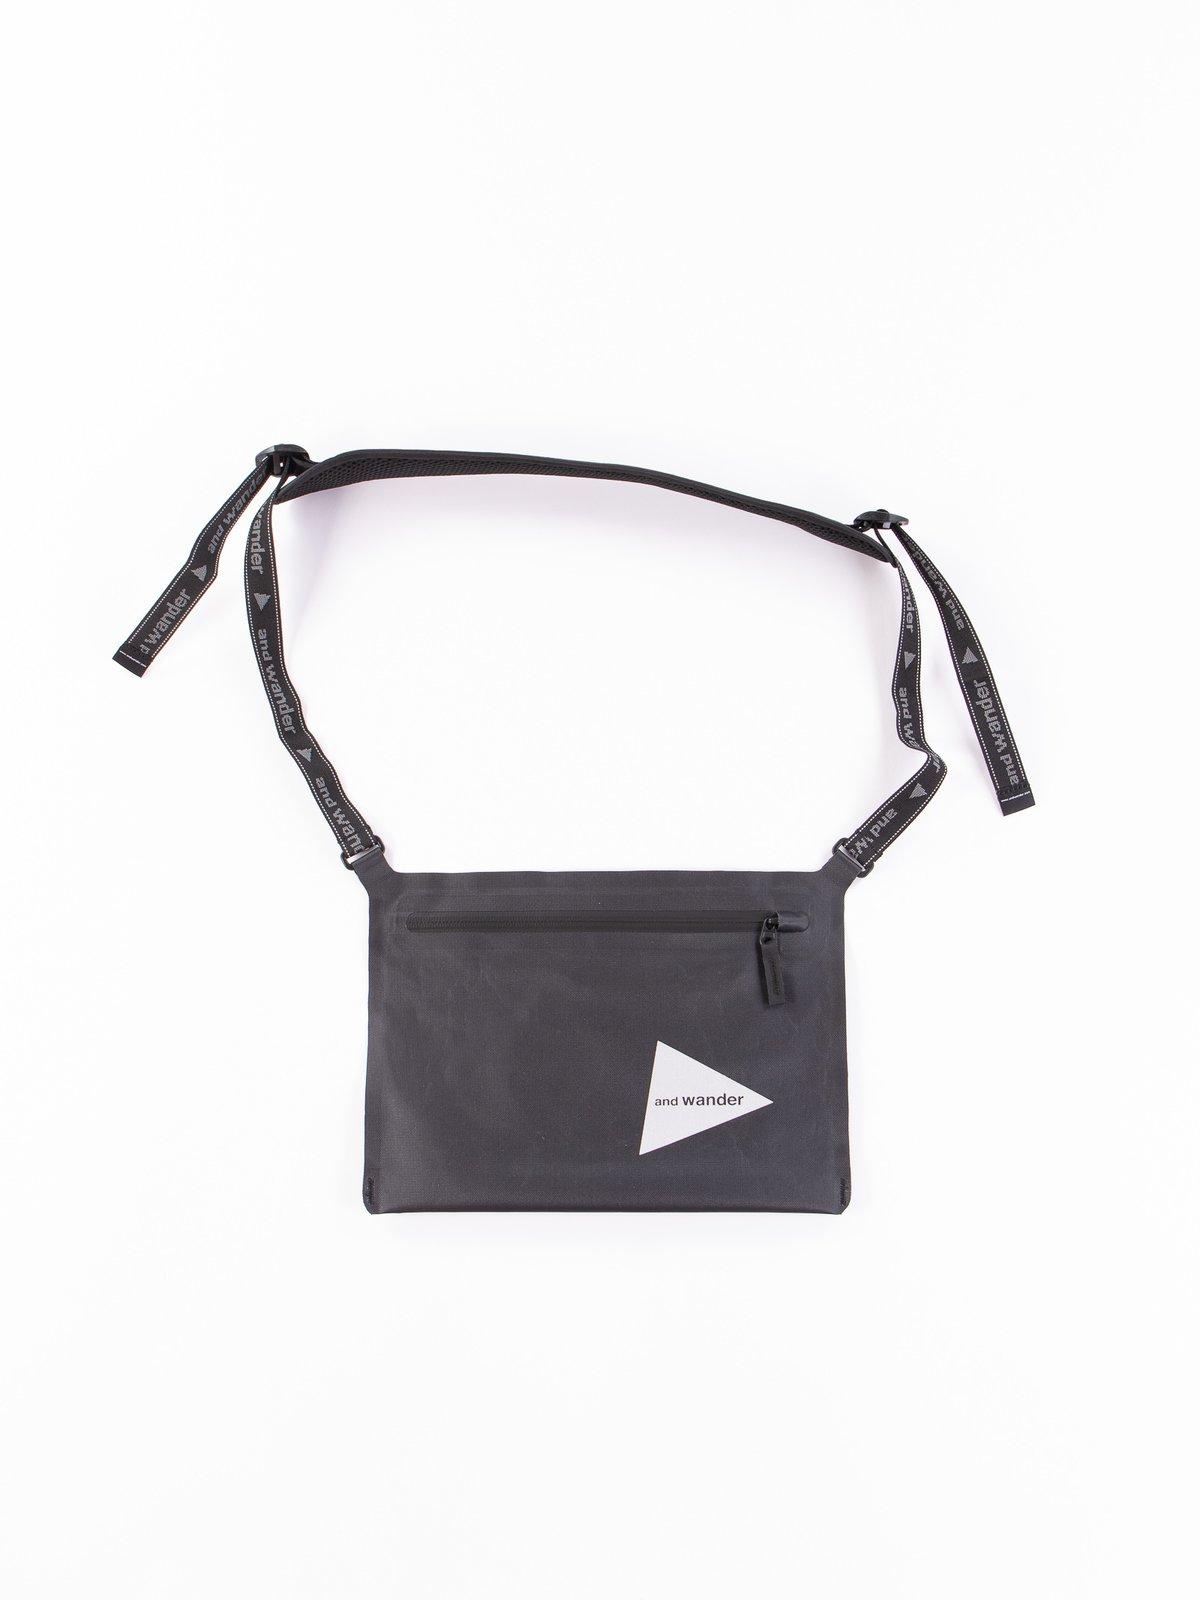 Black Waterproof Sacoche Bag - Image 1